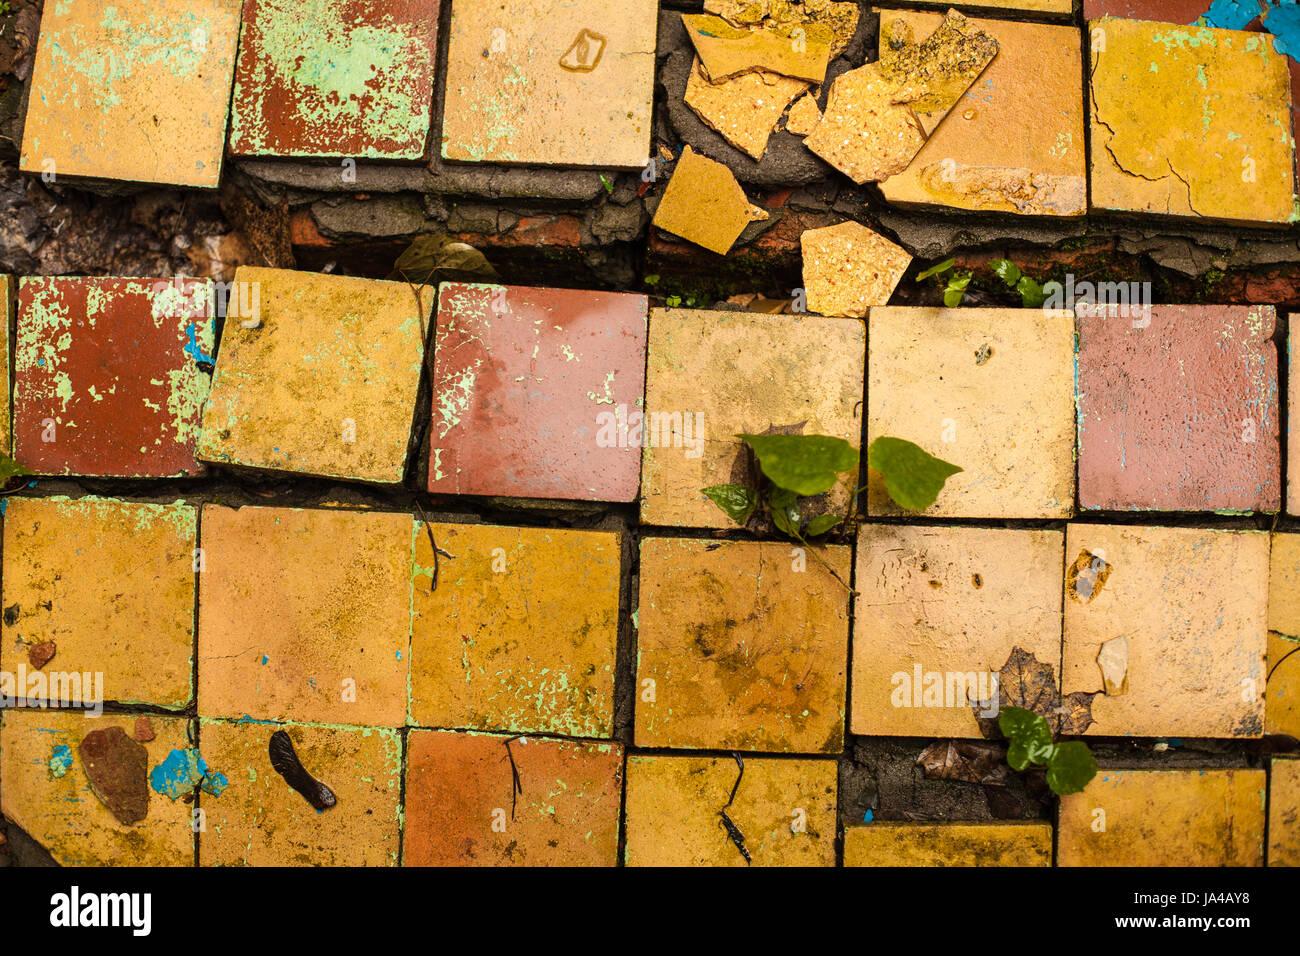 Cracked retro old tiles floor background texture vintage color cracked retro old tiles floor background texture vintage color dirty broken tile dailygadgetfo Choice Image